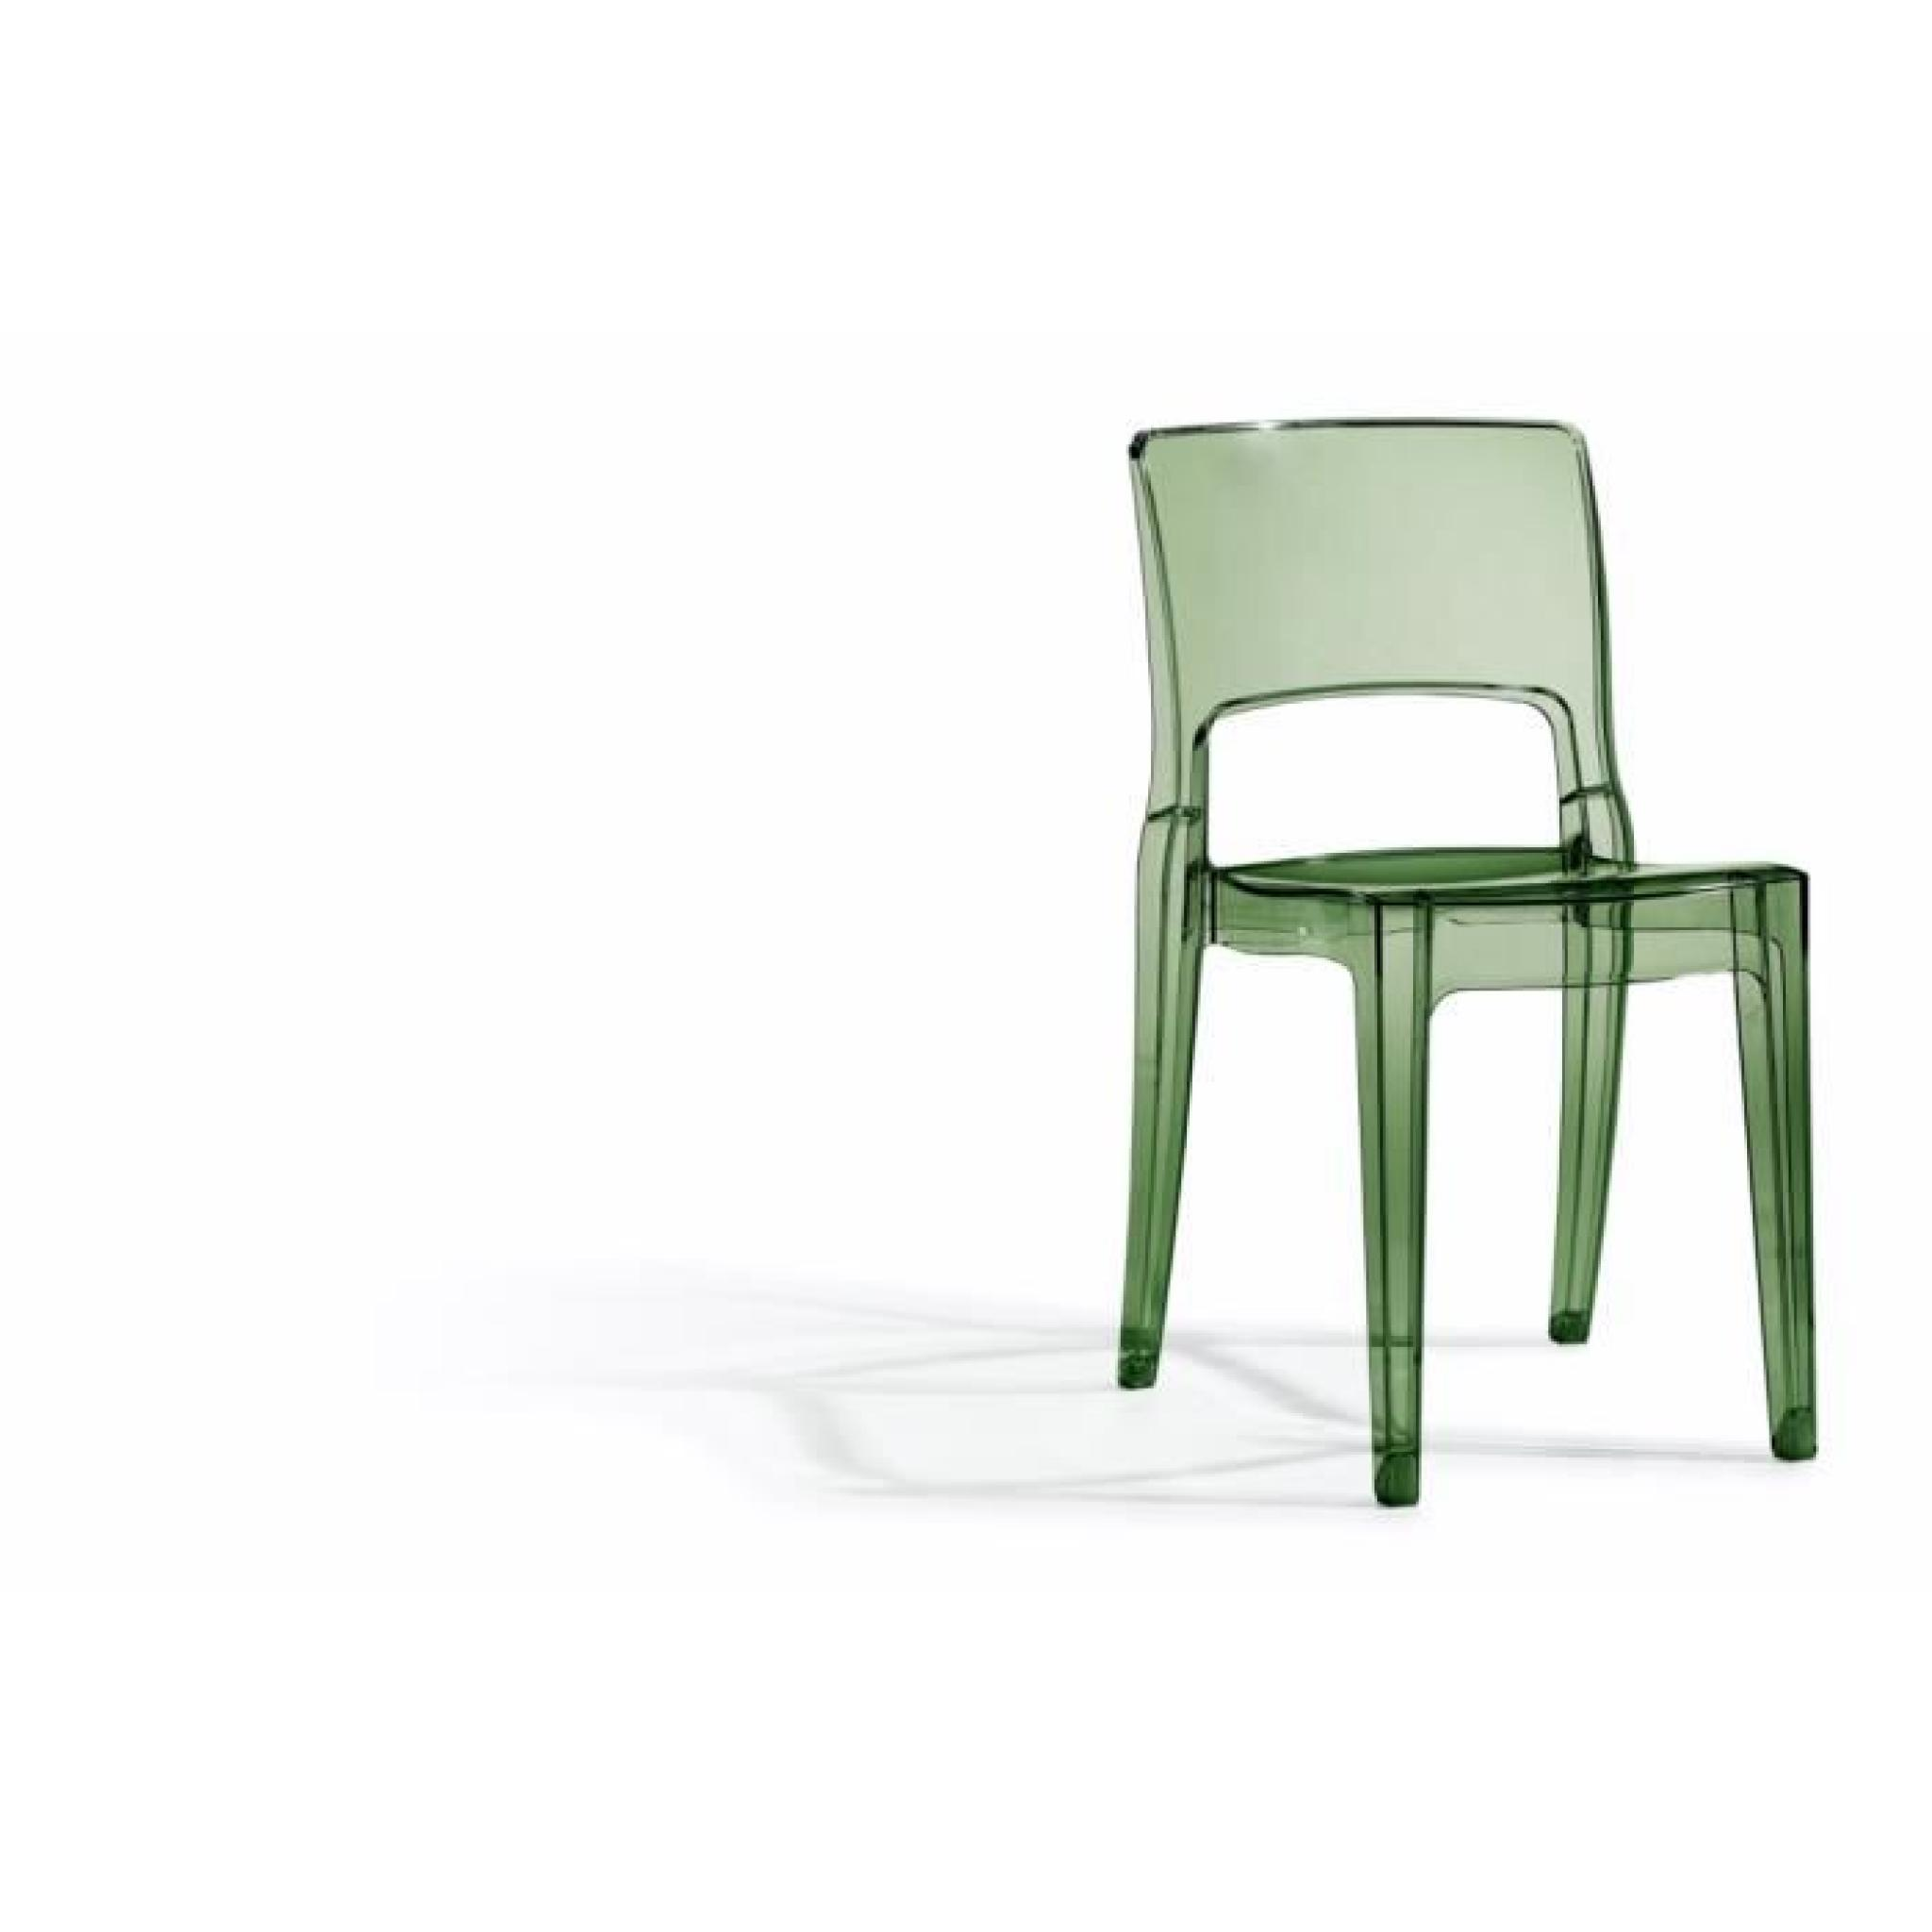 Chaise Grise Transparente Design